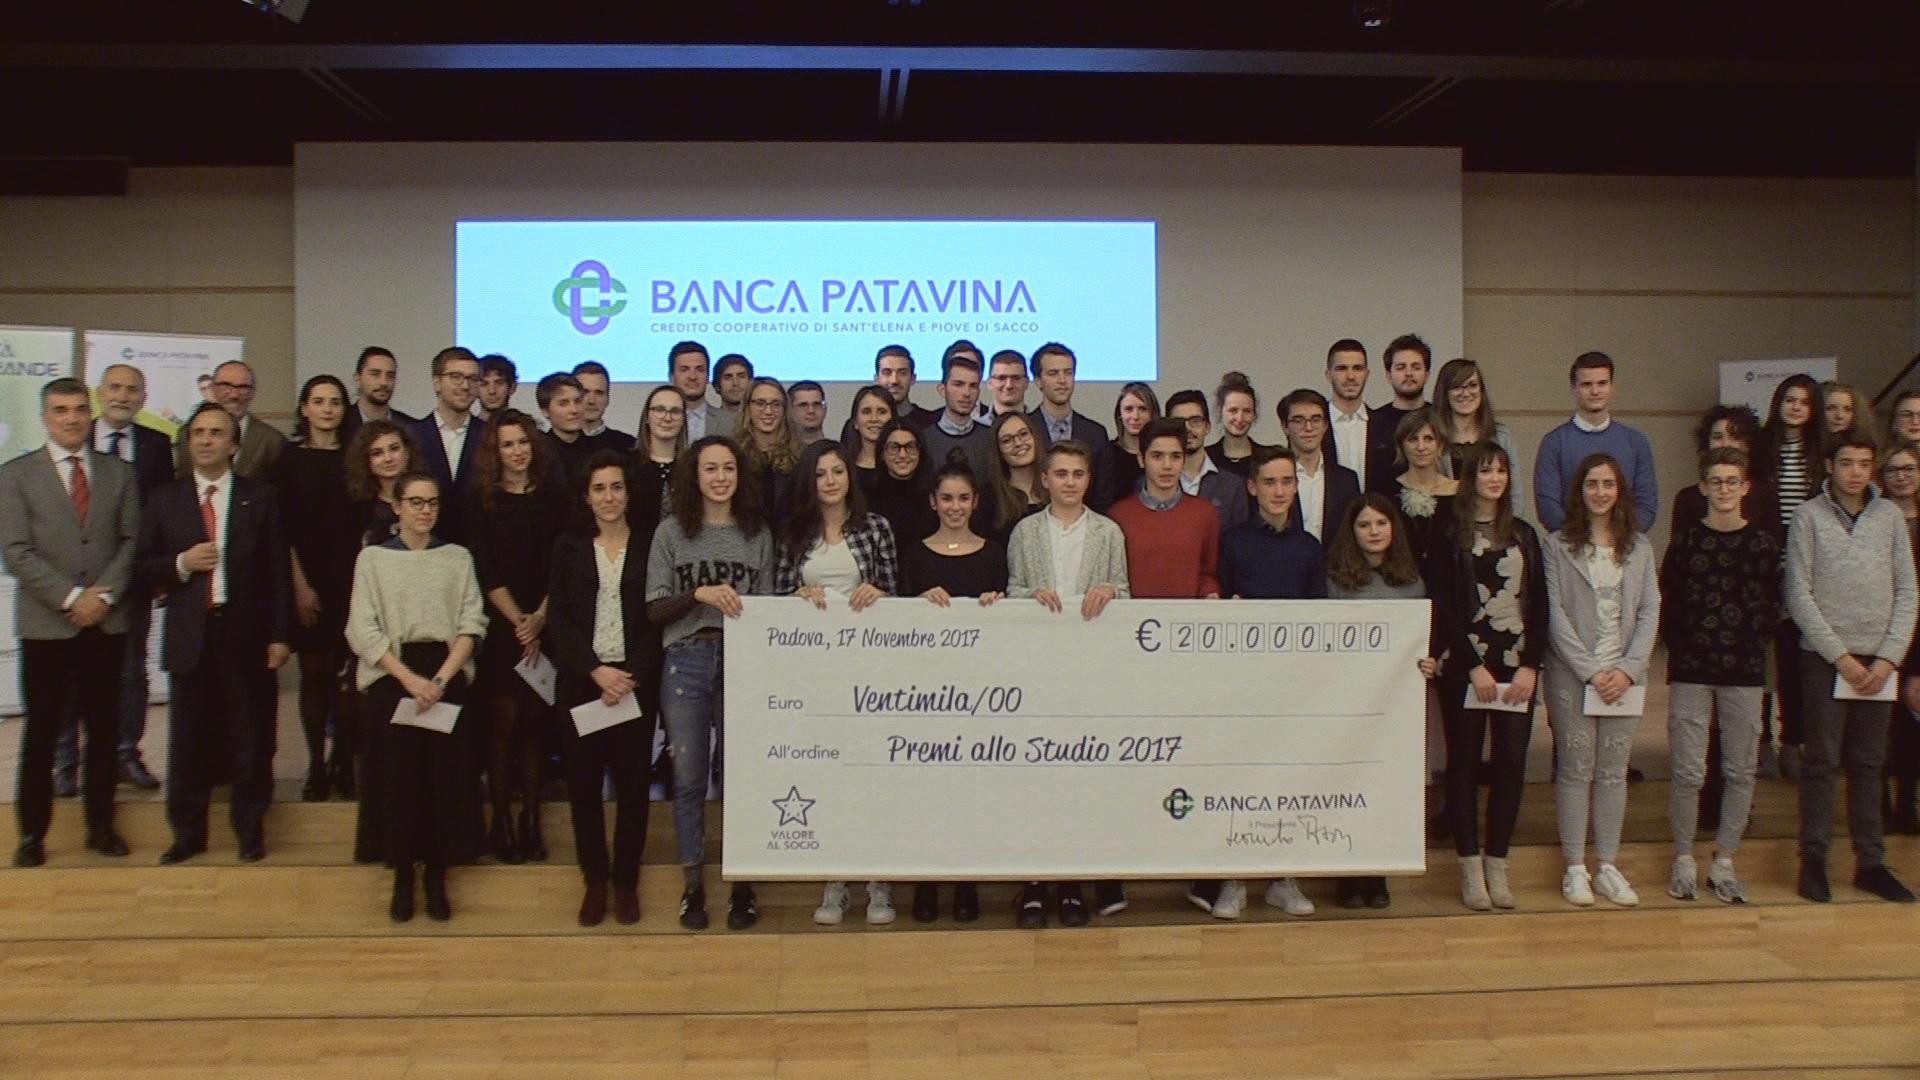 PREMI ALLO STUDIO – BANCA PATAVINA PREMIA 62 GIOVANI STUDENTI